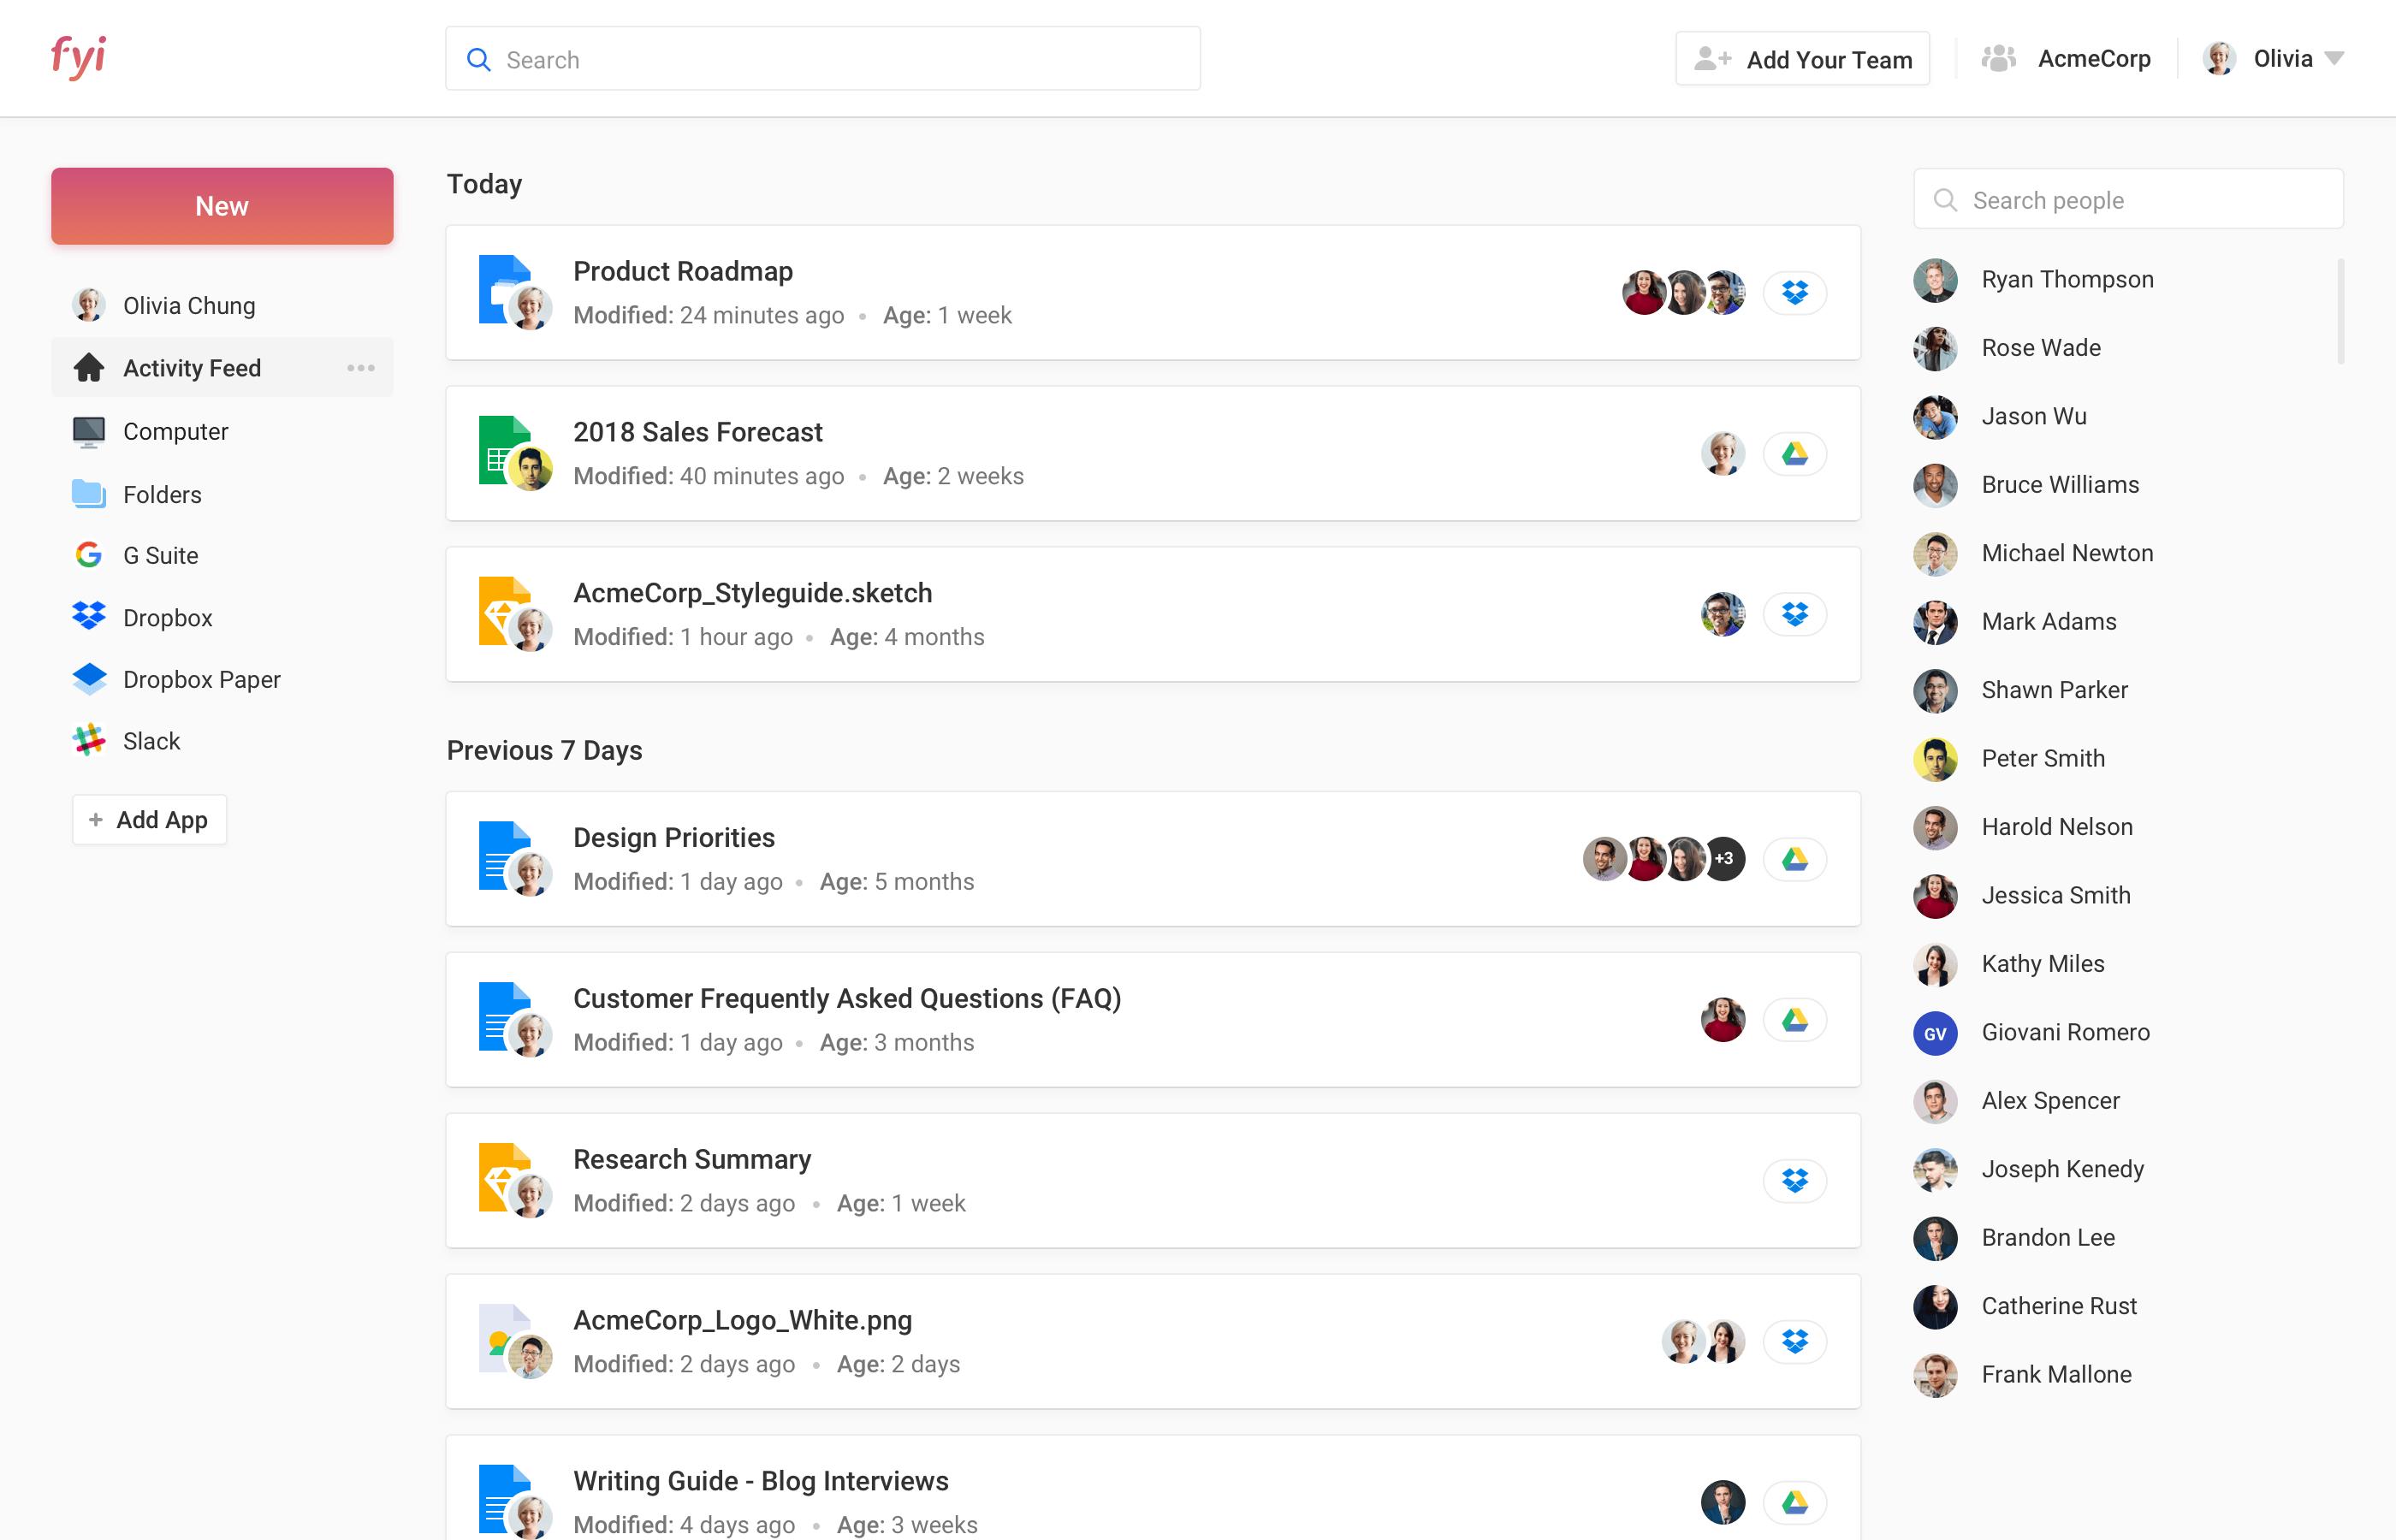 fyi interface